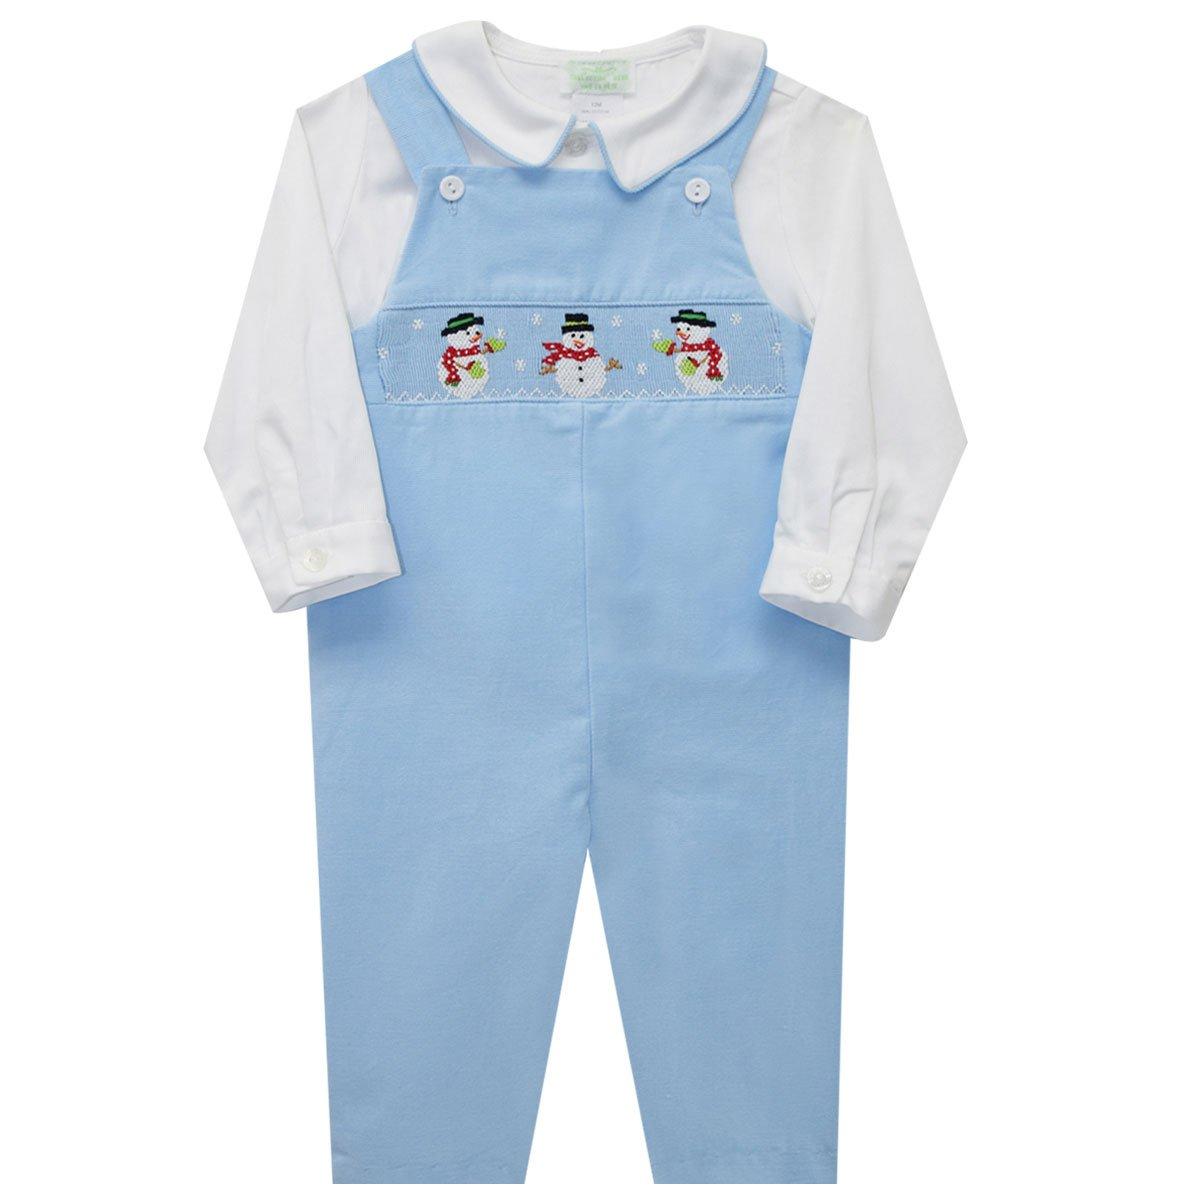 COLLECTION BEBE Snowman Smocked Boys Overall and Shirt Long Sleeve